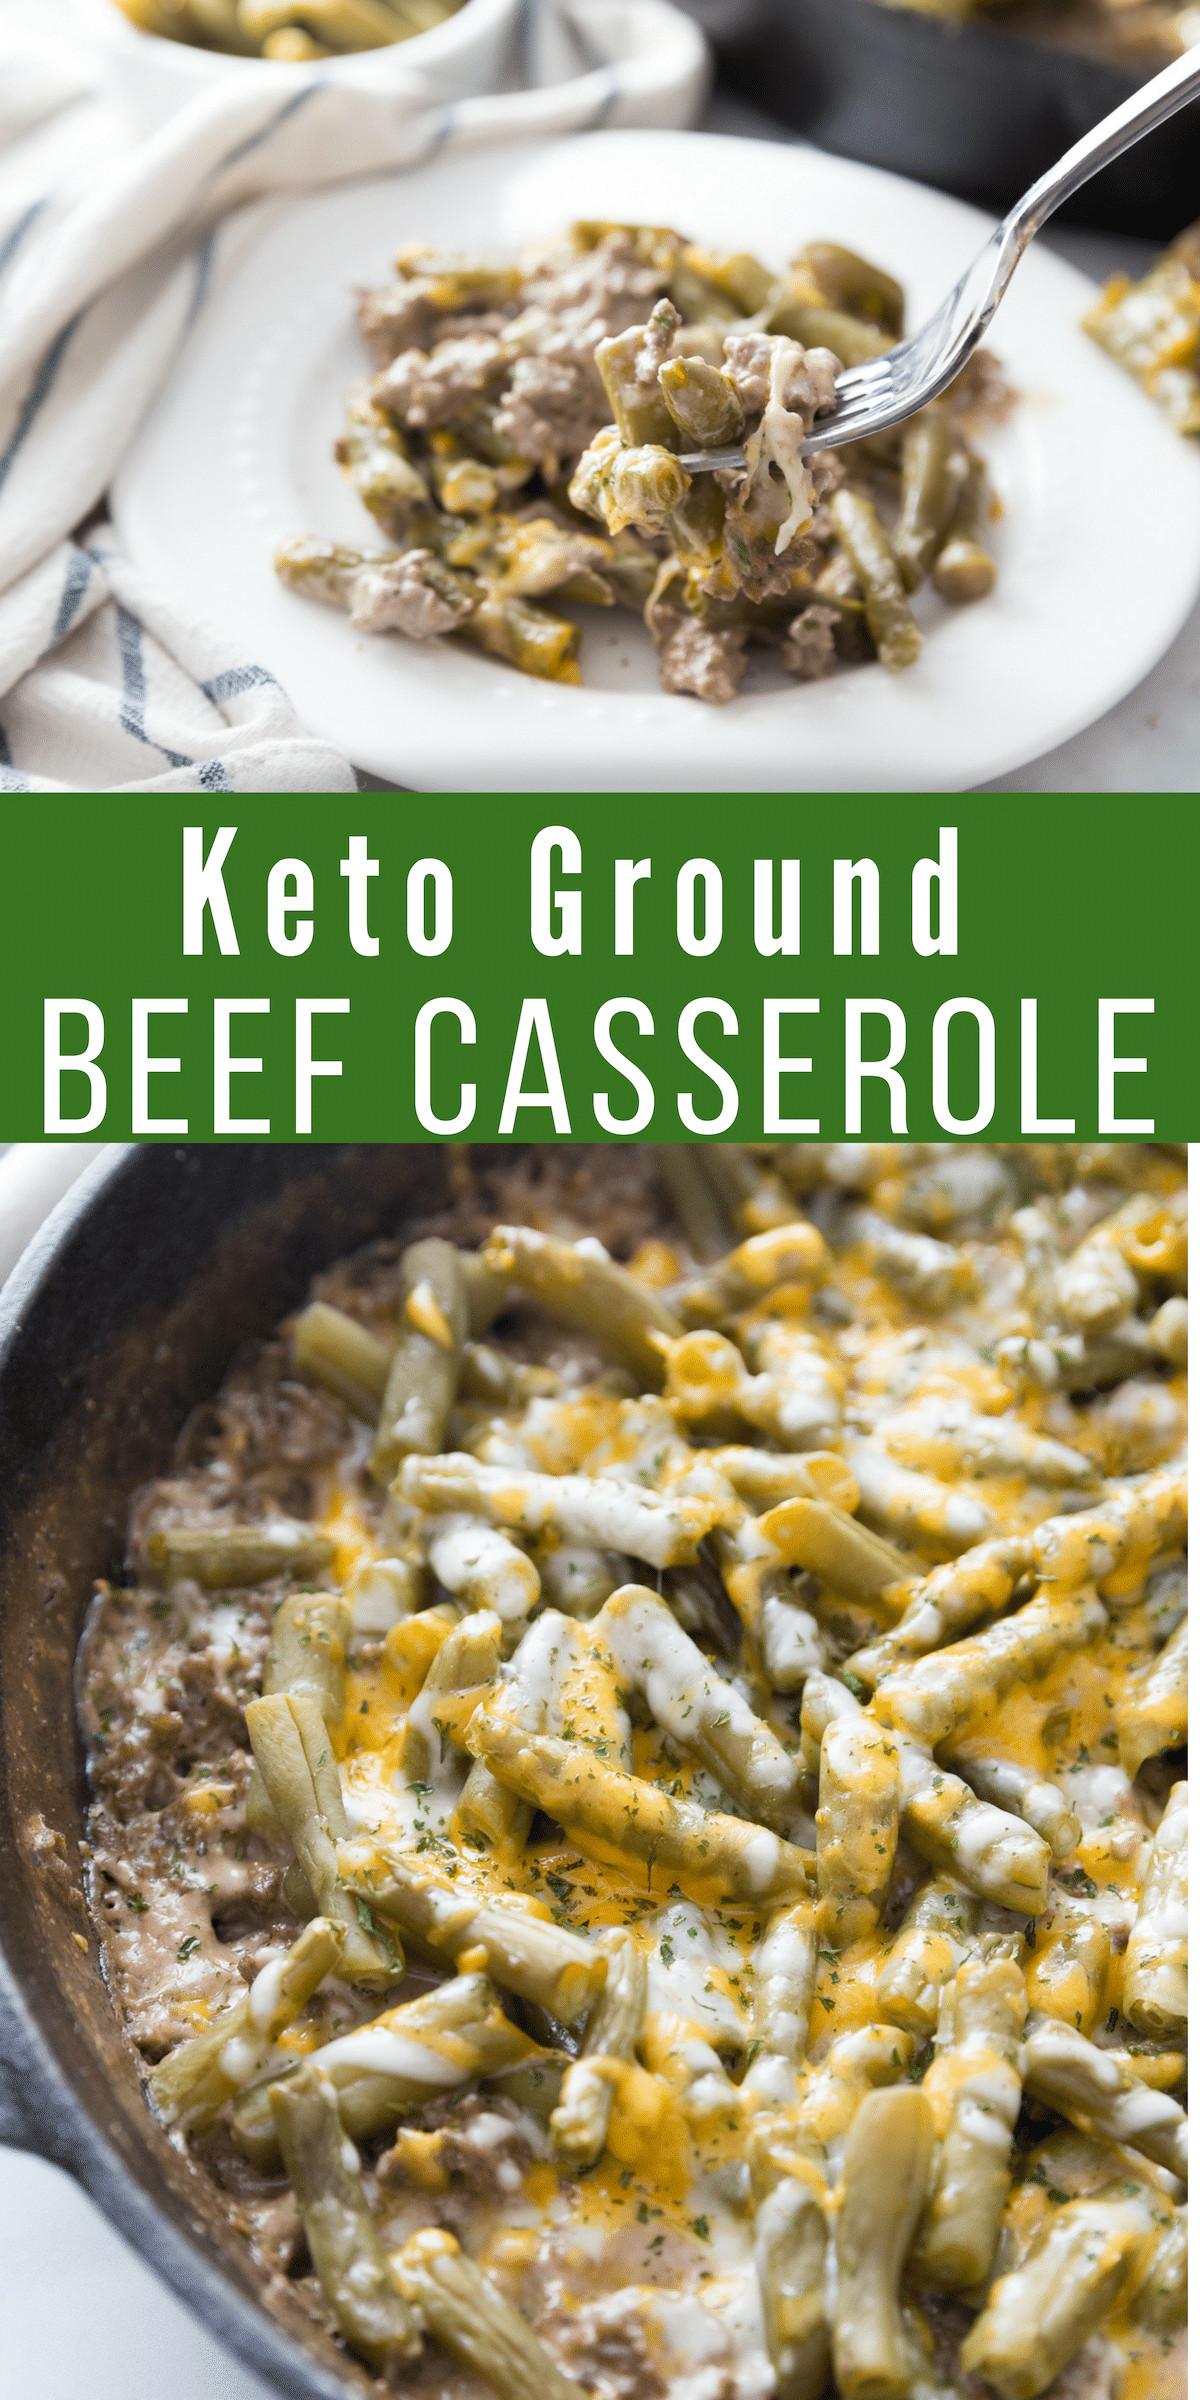 Hamburger Keto Recipes Beef  Keto Ground Beef Casserole Perfect fort Dish